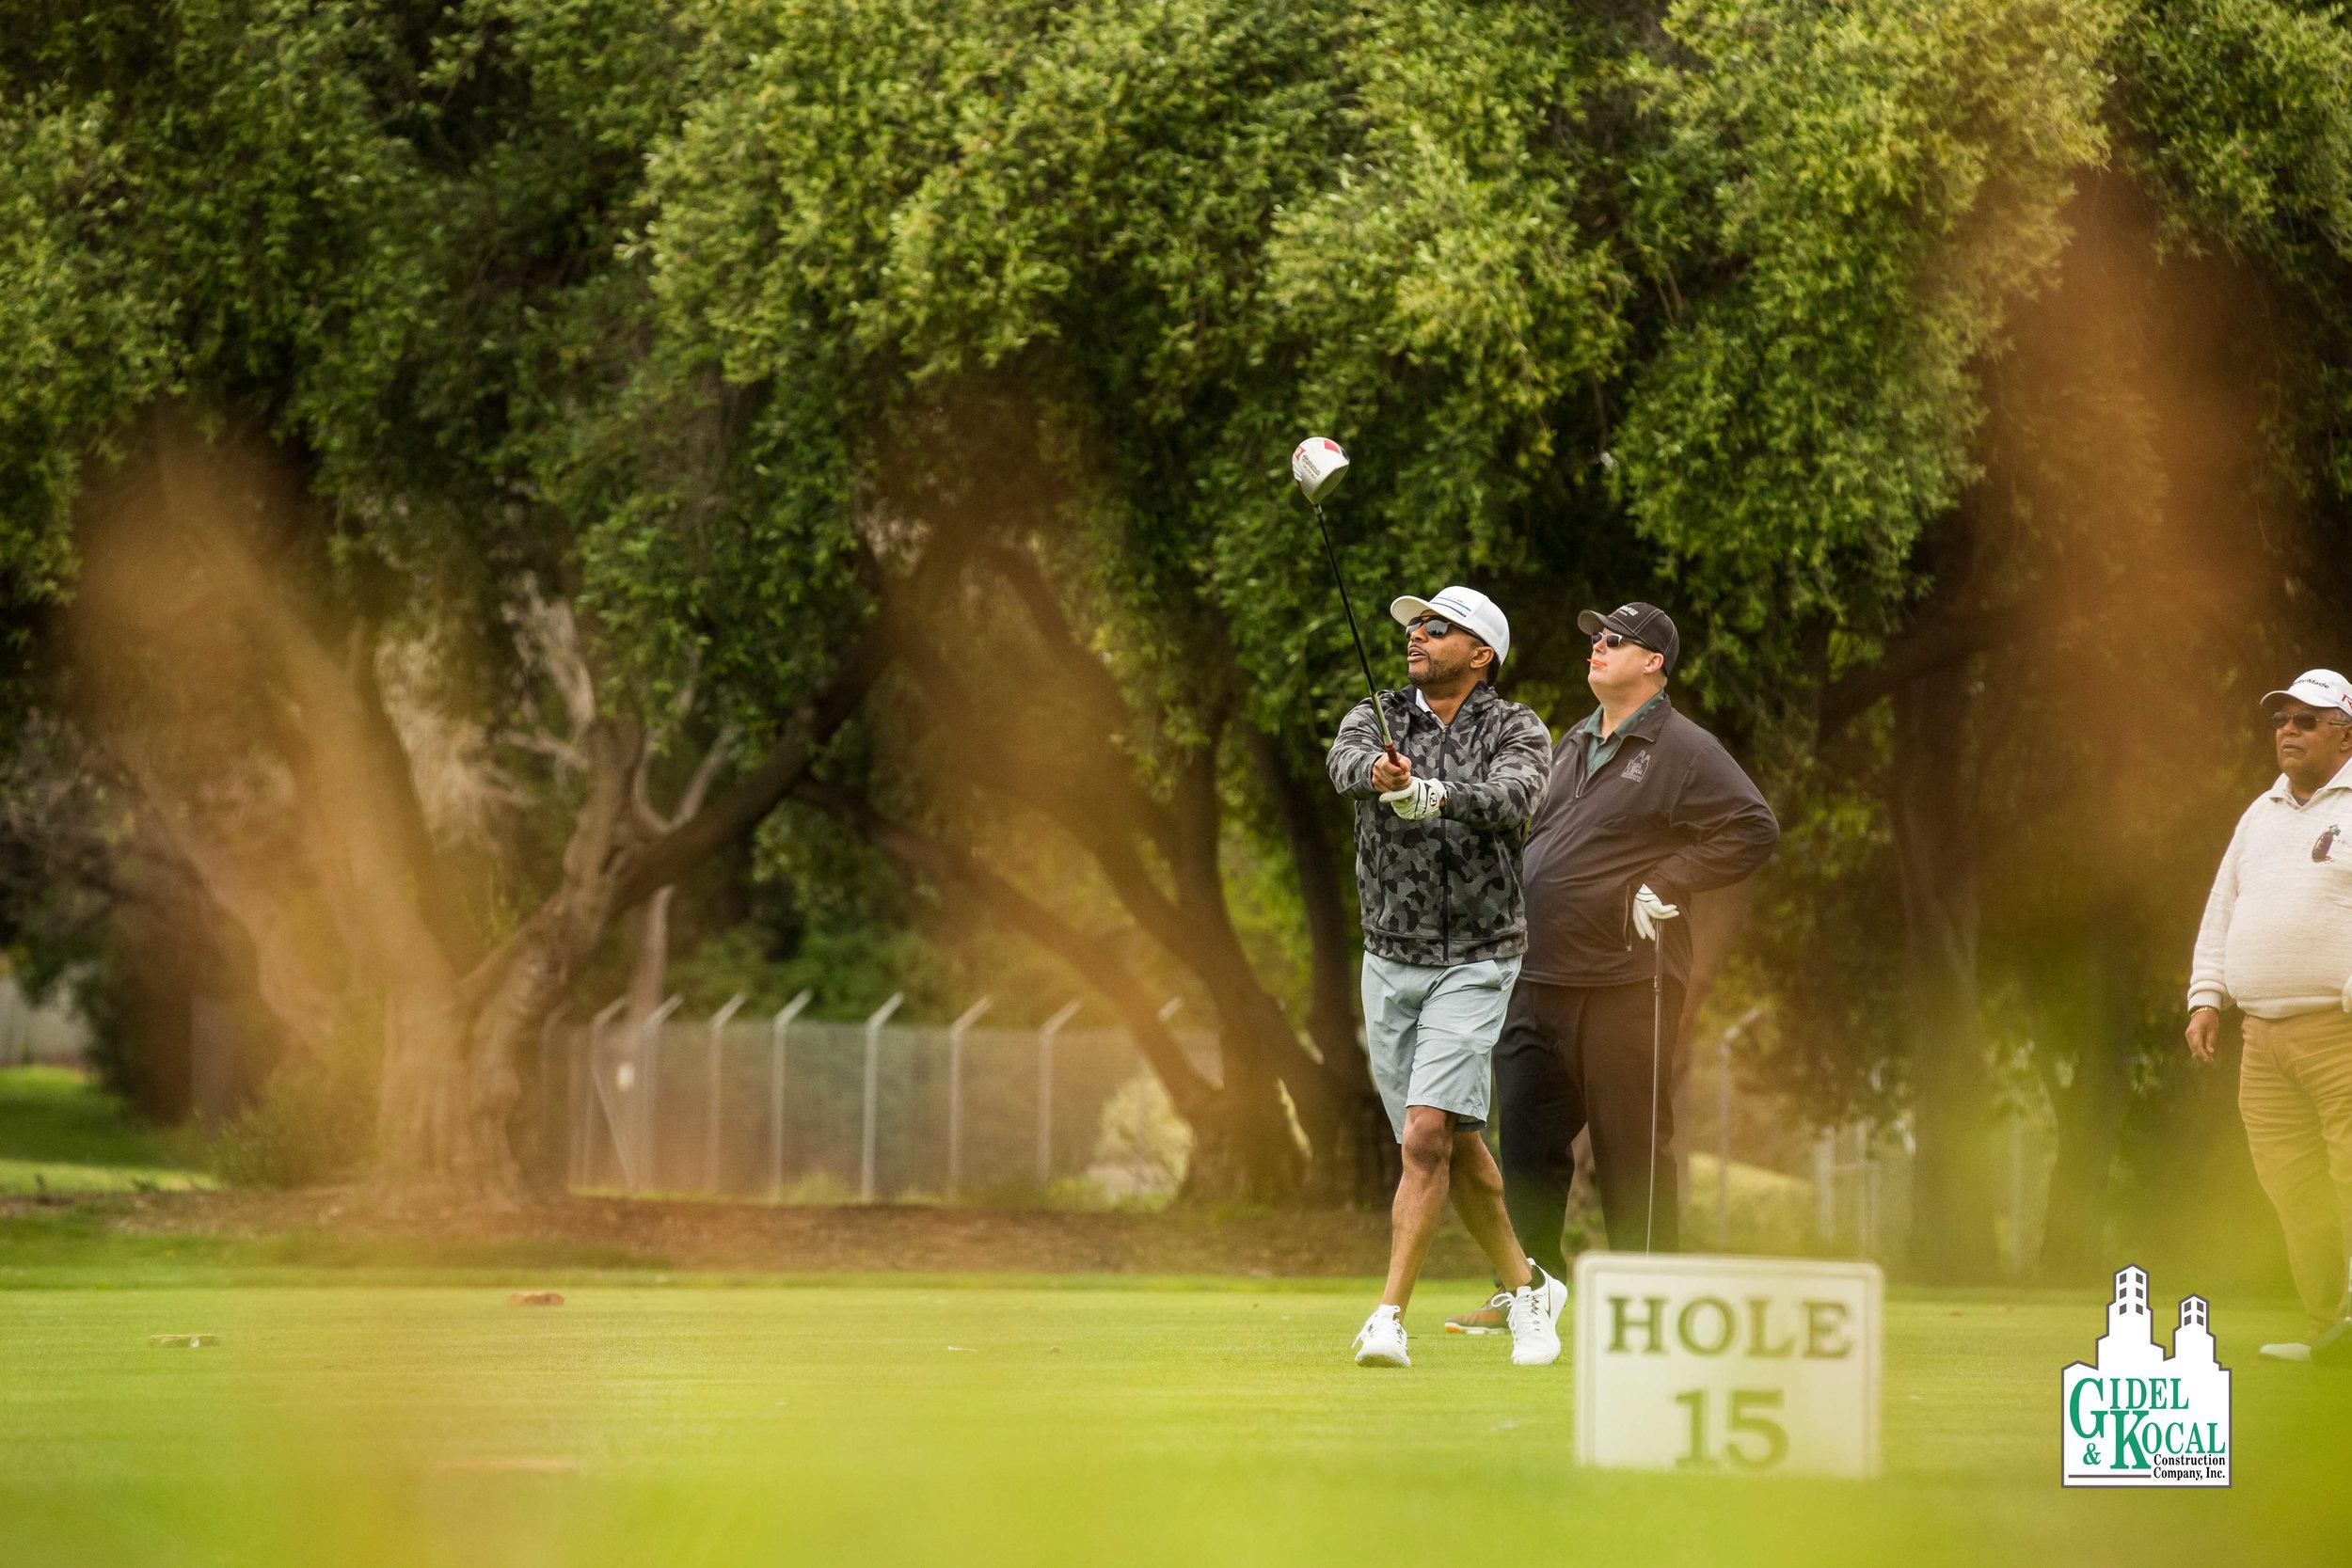 2017-04-17_GK_Golf_DBAPIX-233_LORES.jpg